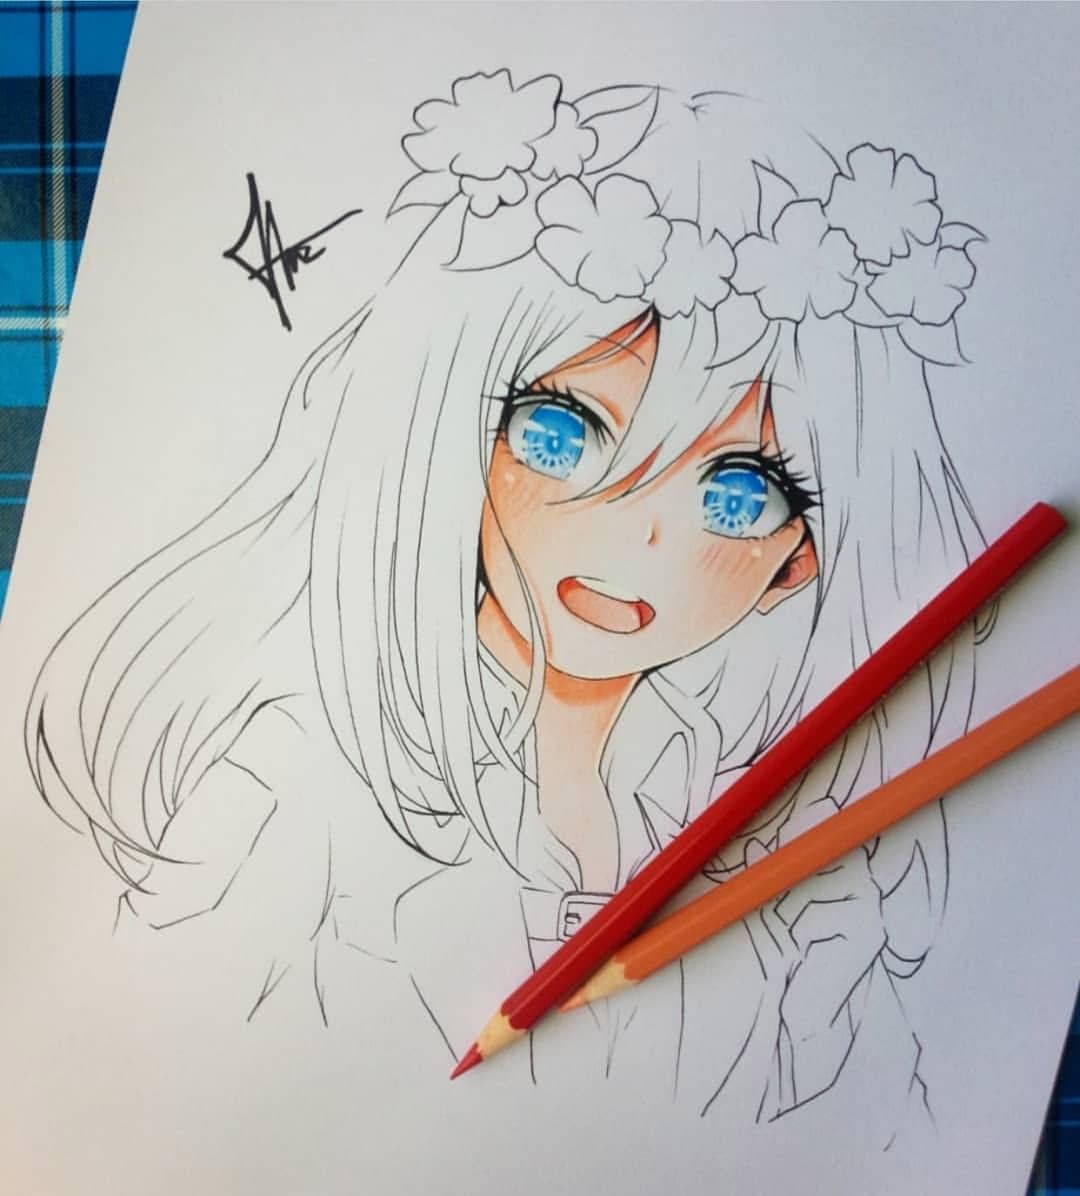 Anime Ignite Anime Art Anime Drawings Anime Sketch